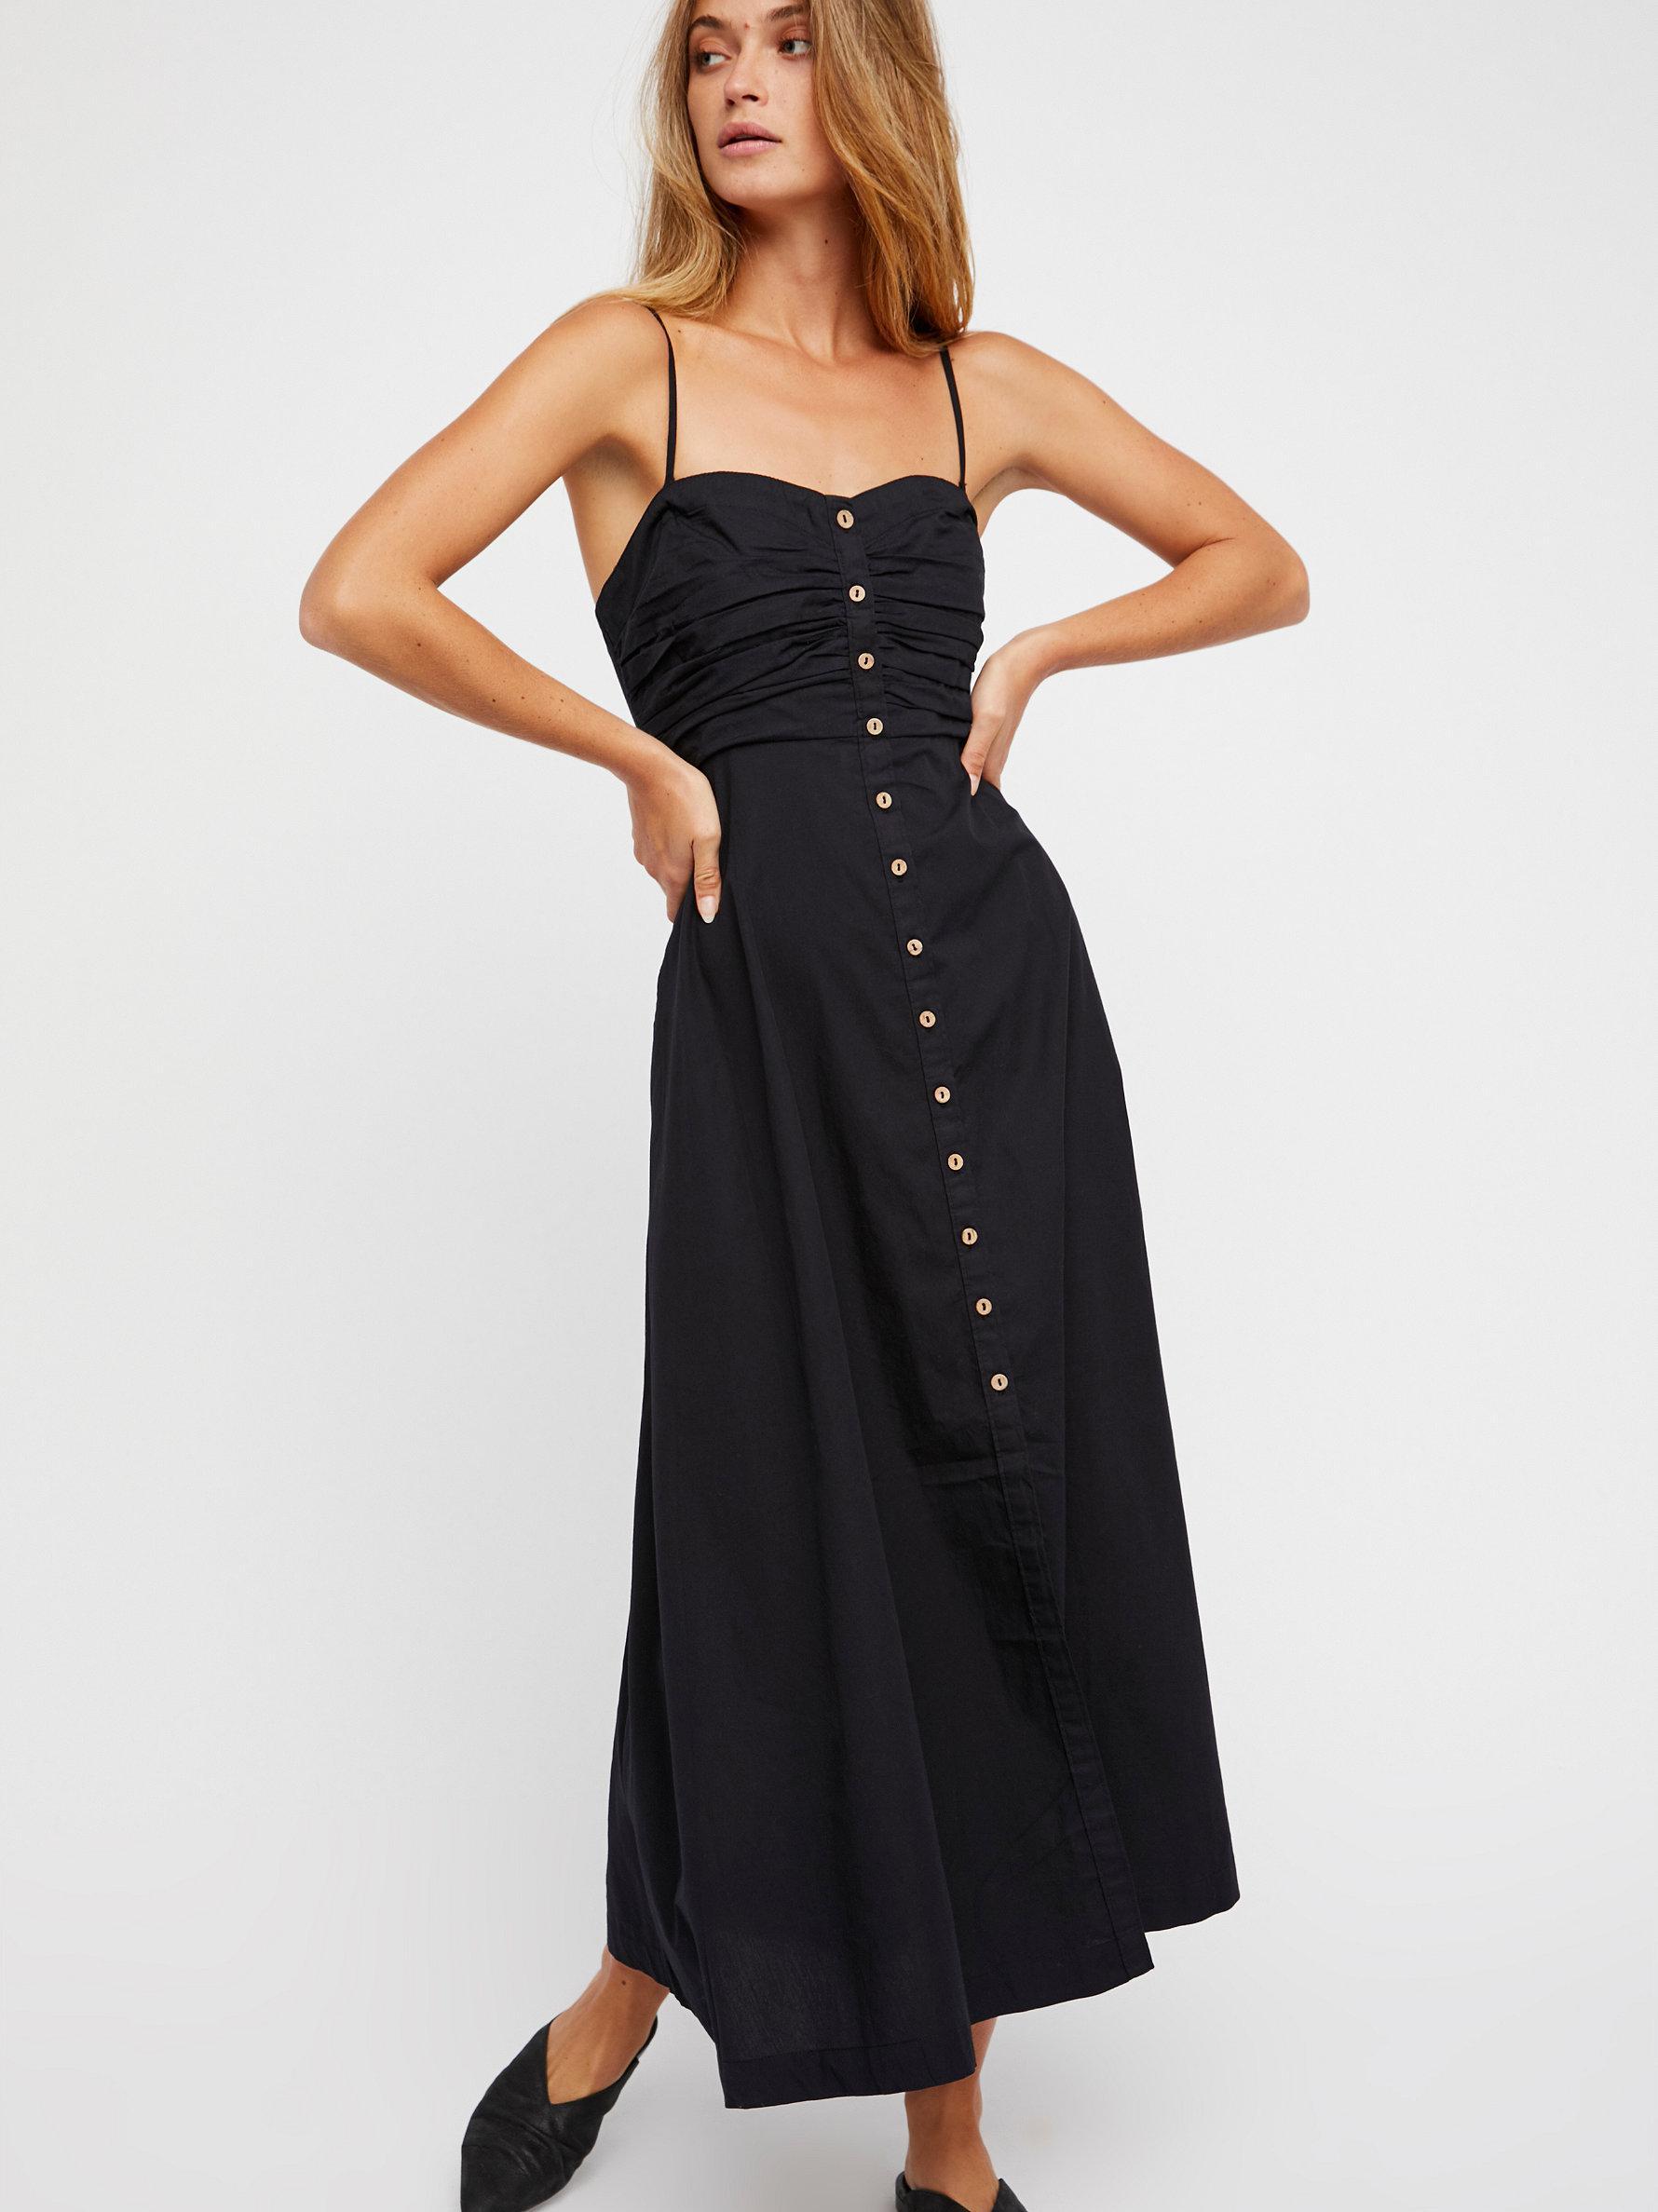 30a6f9a771 Free People The Isha Tube Midi Dress in Black - Lyst